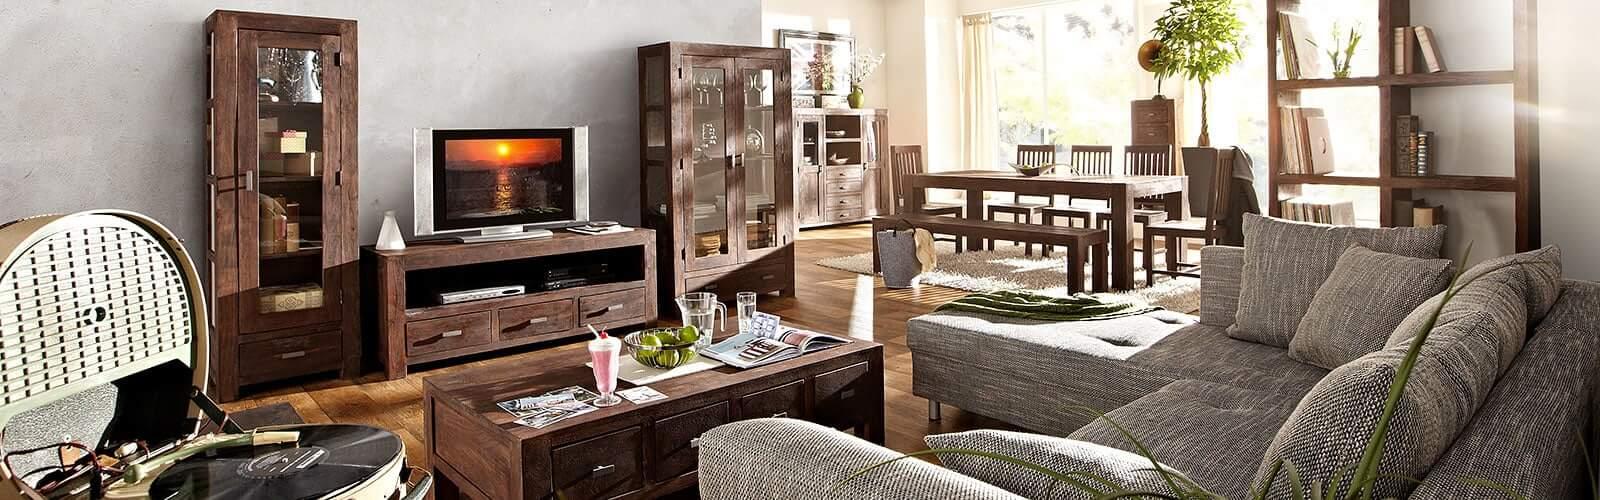 Möbel aus Akazieholz